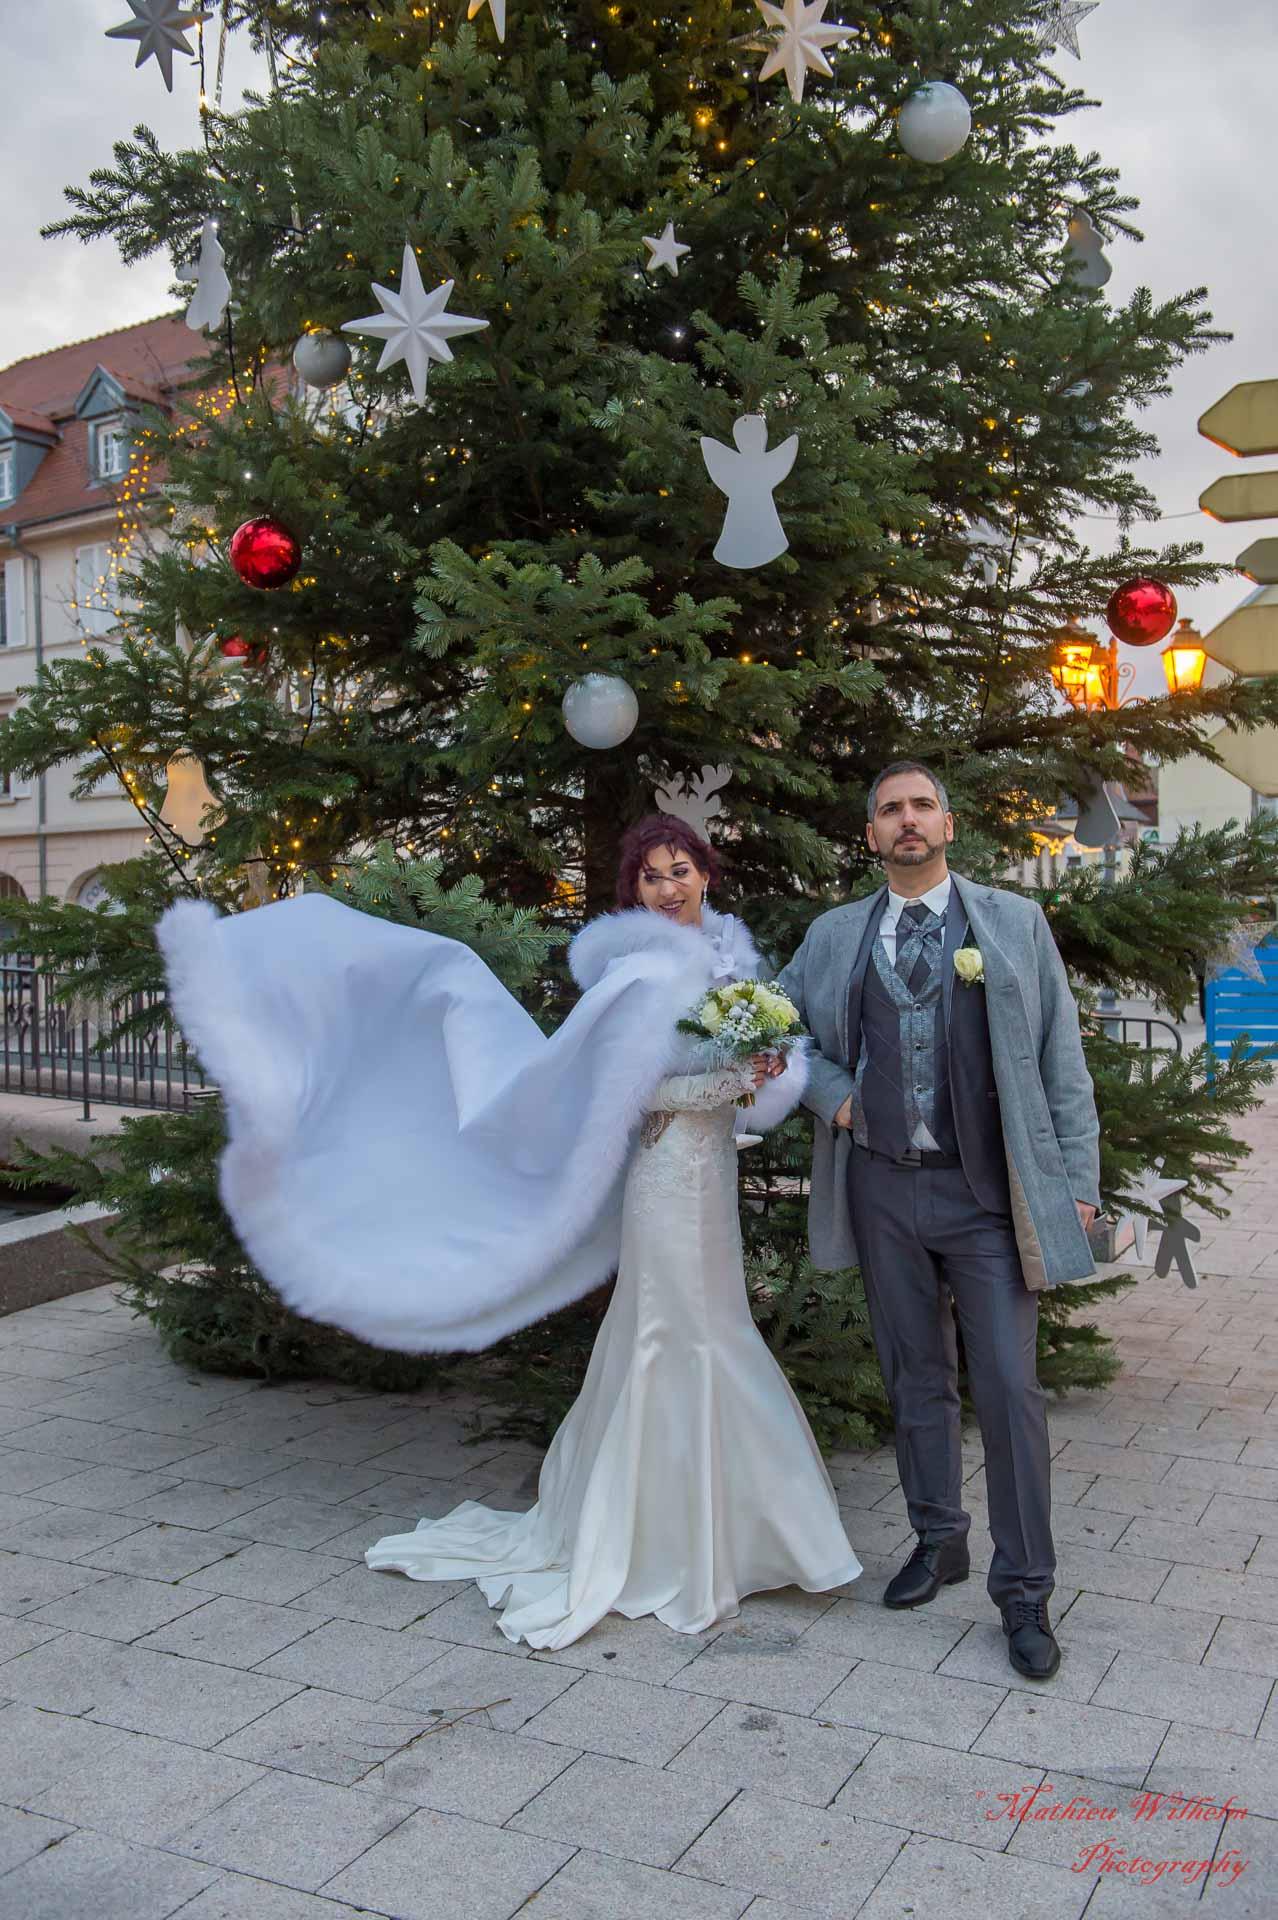 2018-12-01 Alexandra et Fabian (426)